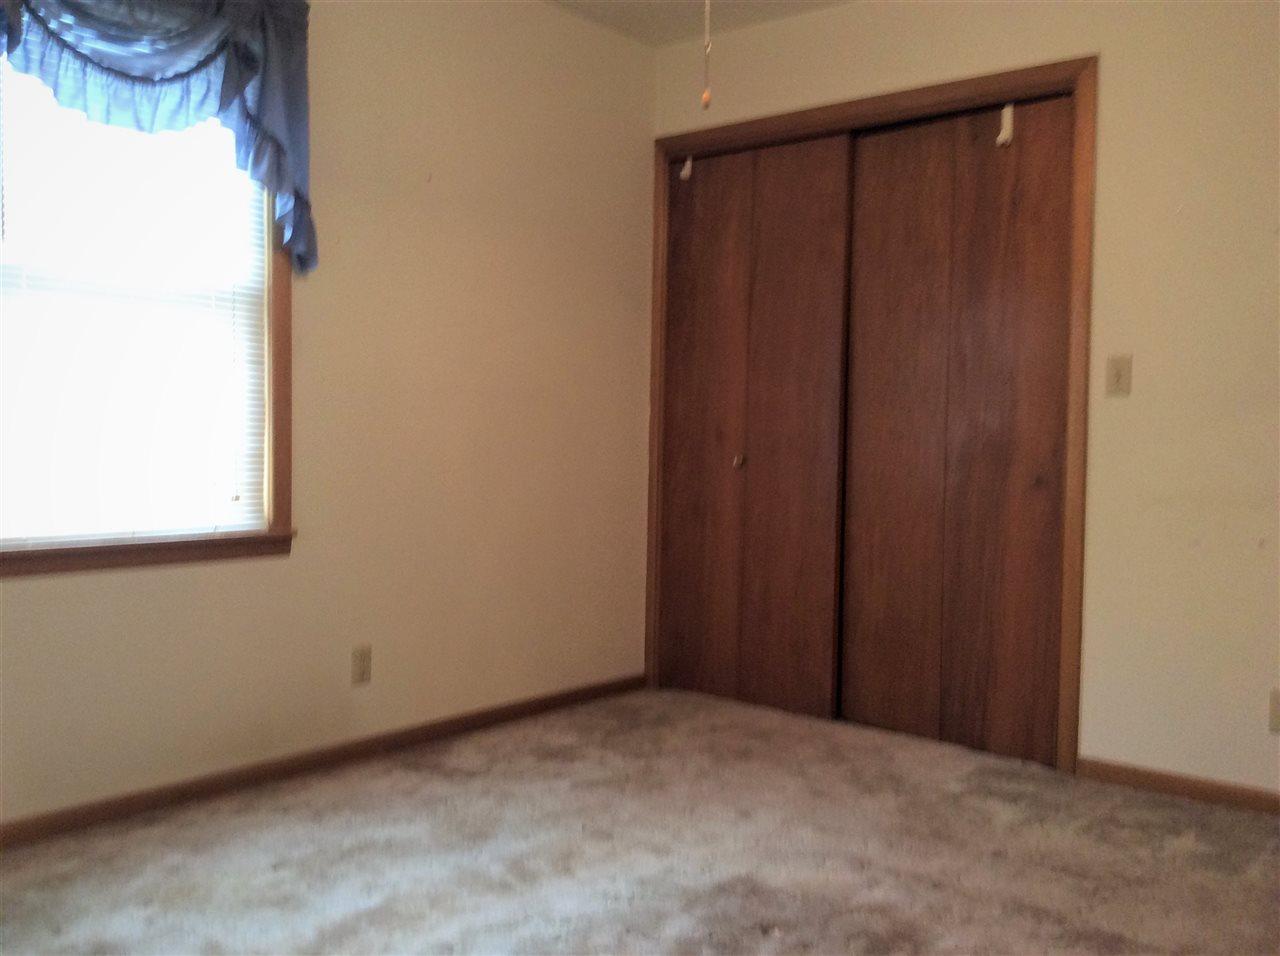 103 N SEDGWICK ST, HAVEN, KS 67543  Photo 13